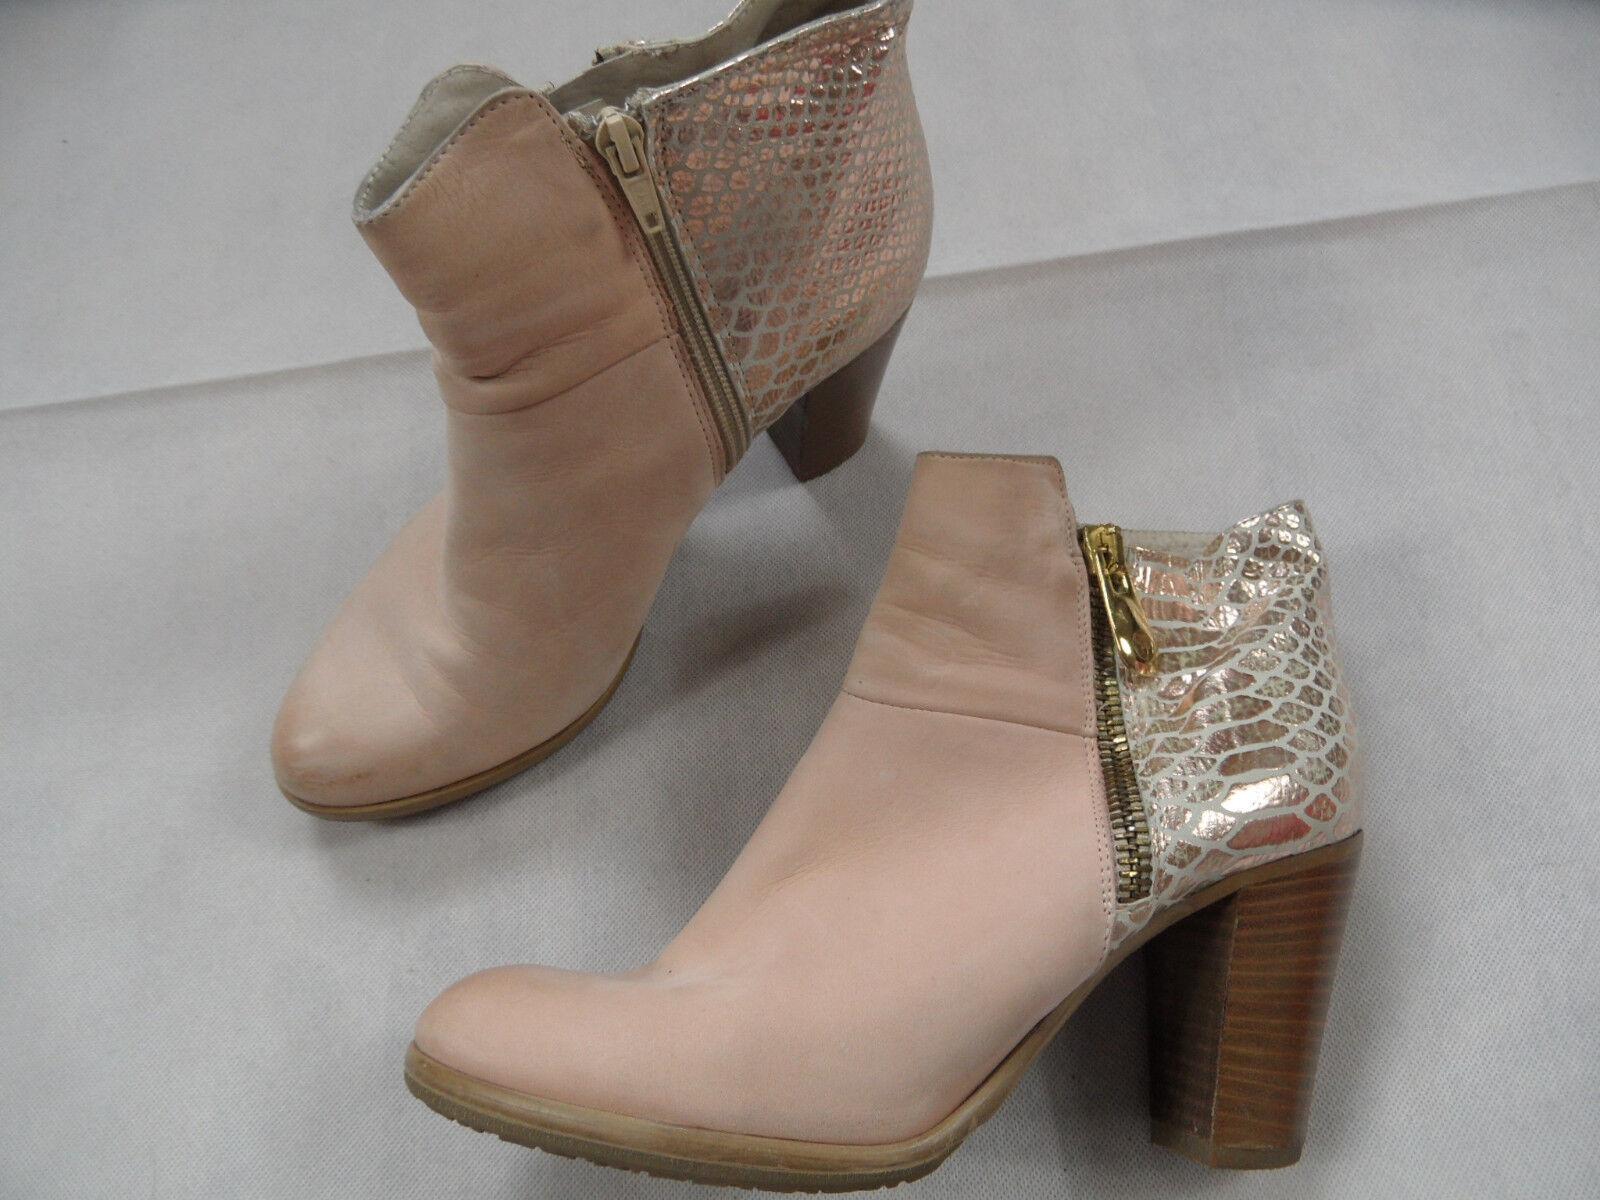 MANFIELD stylische Stiefeletten rosa Gr. 41 TOP SJ718